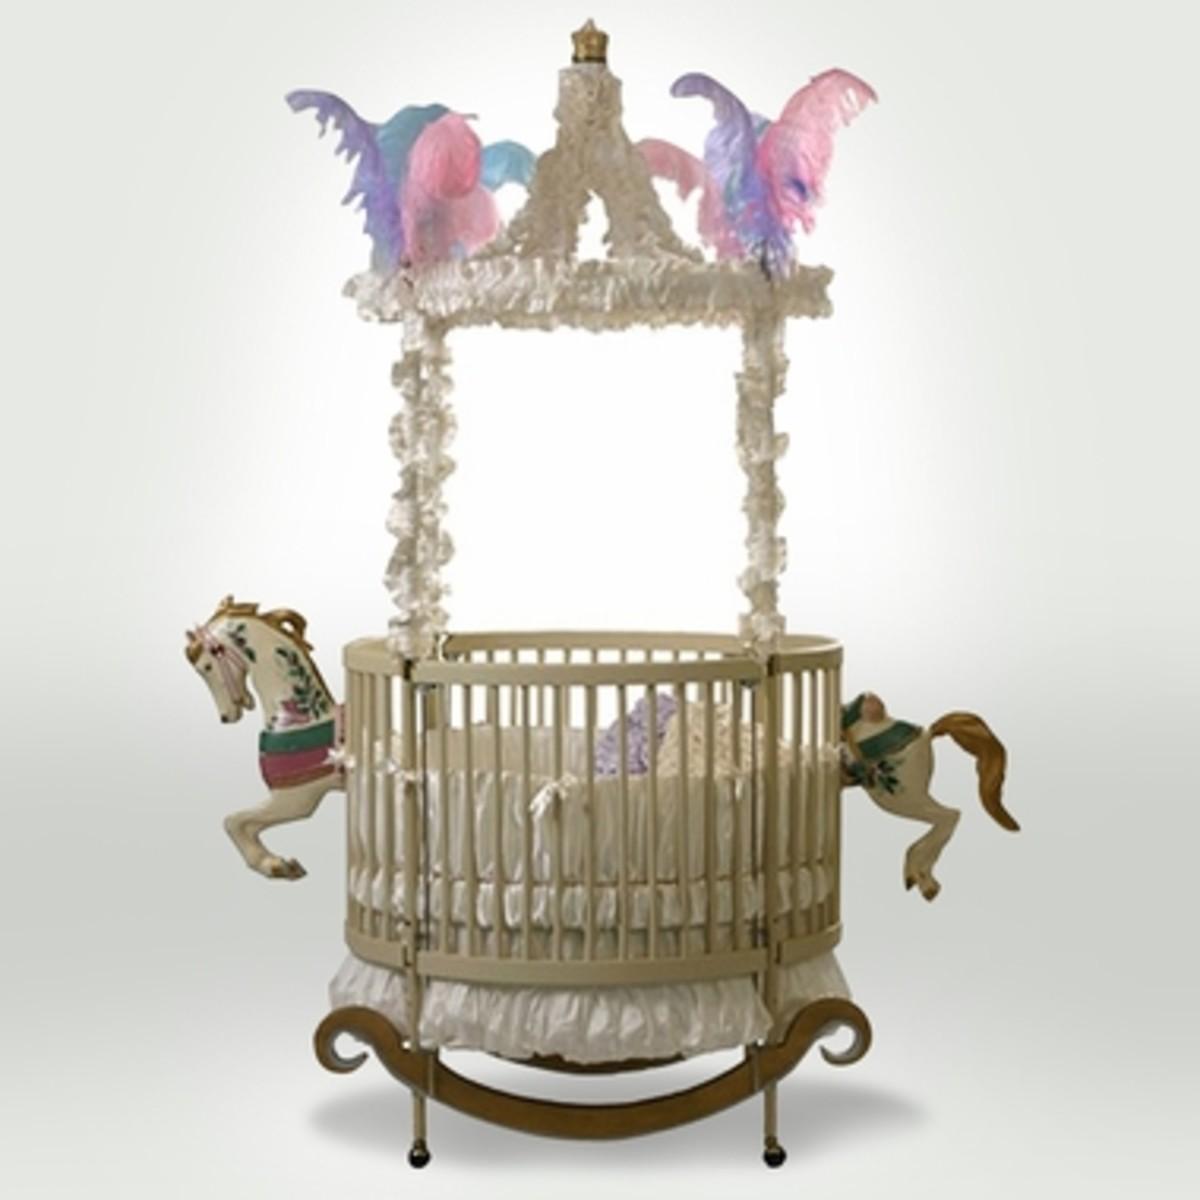 Design a Girl's Dream Bedroom or Nursery With a Carousel Horse Theme